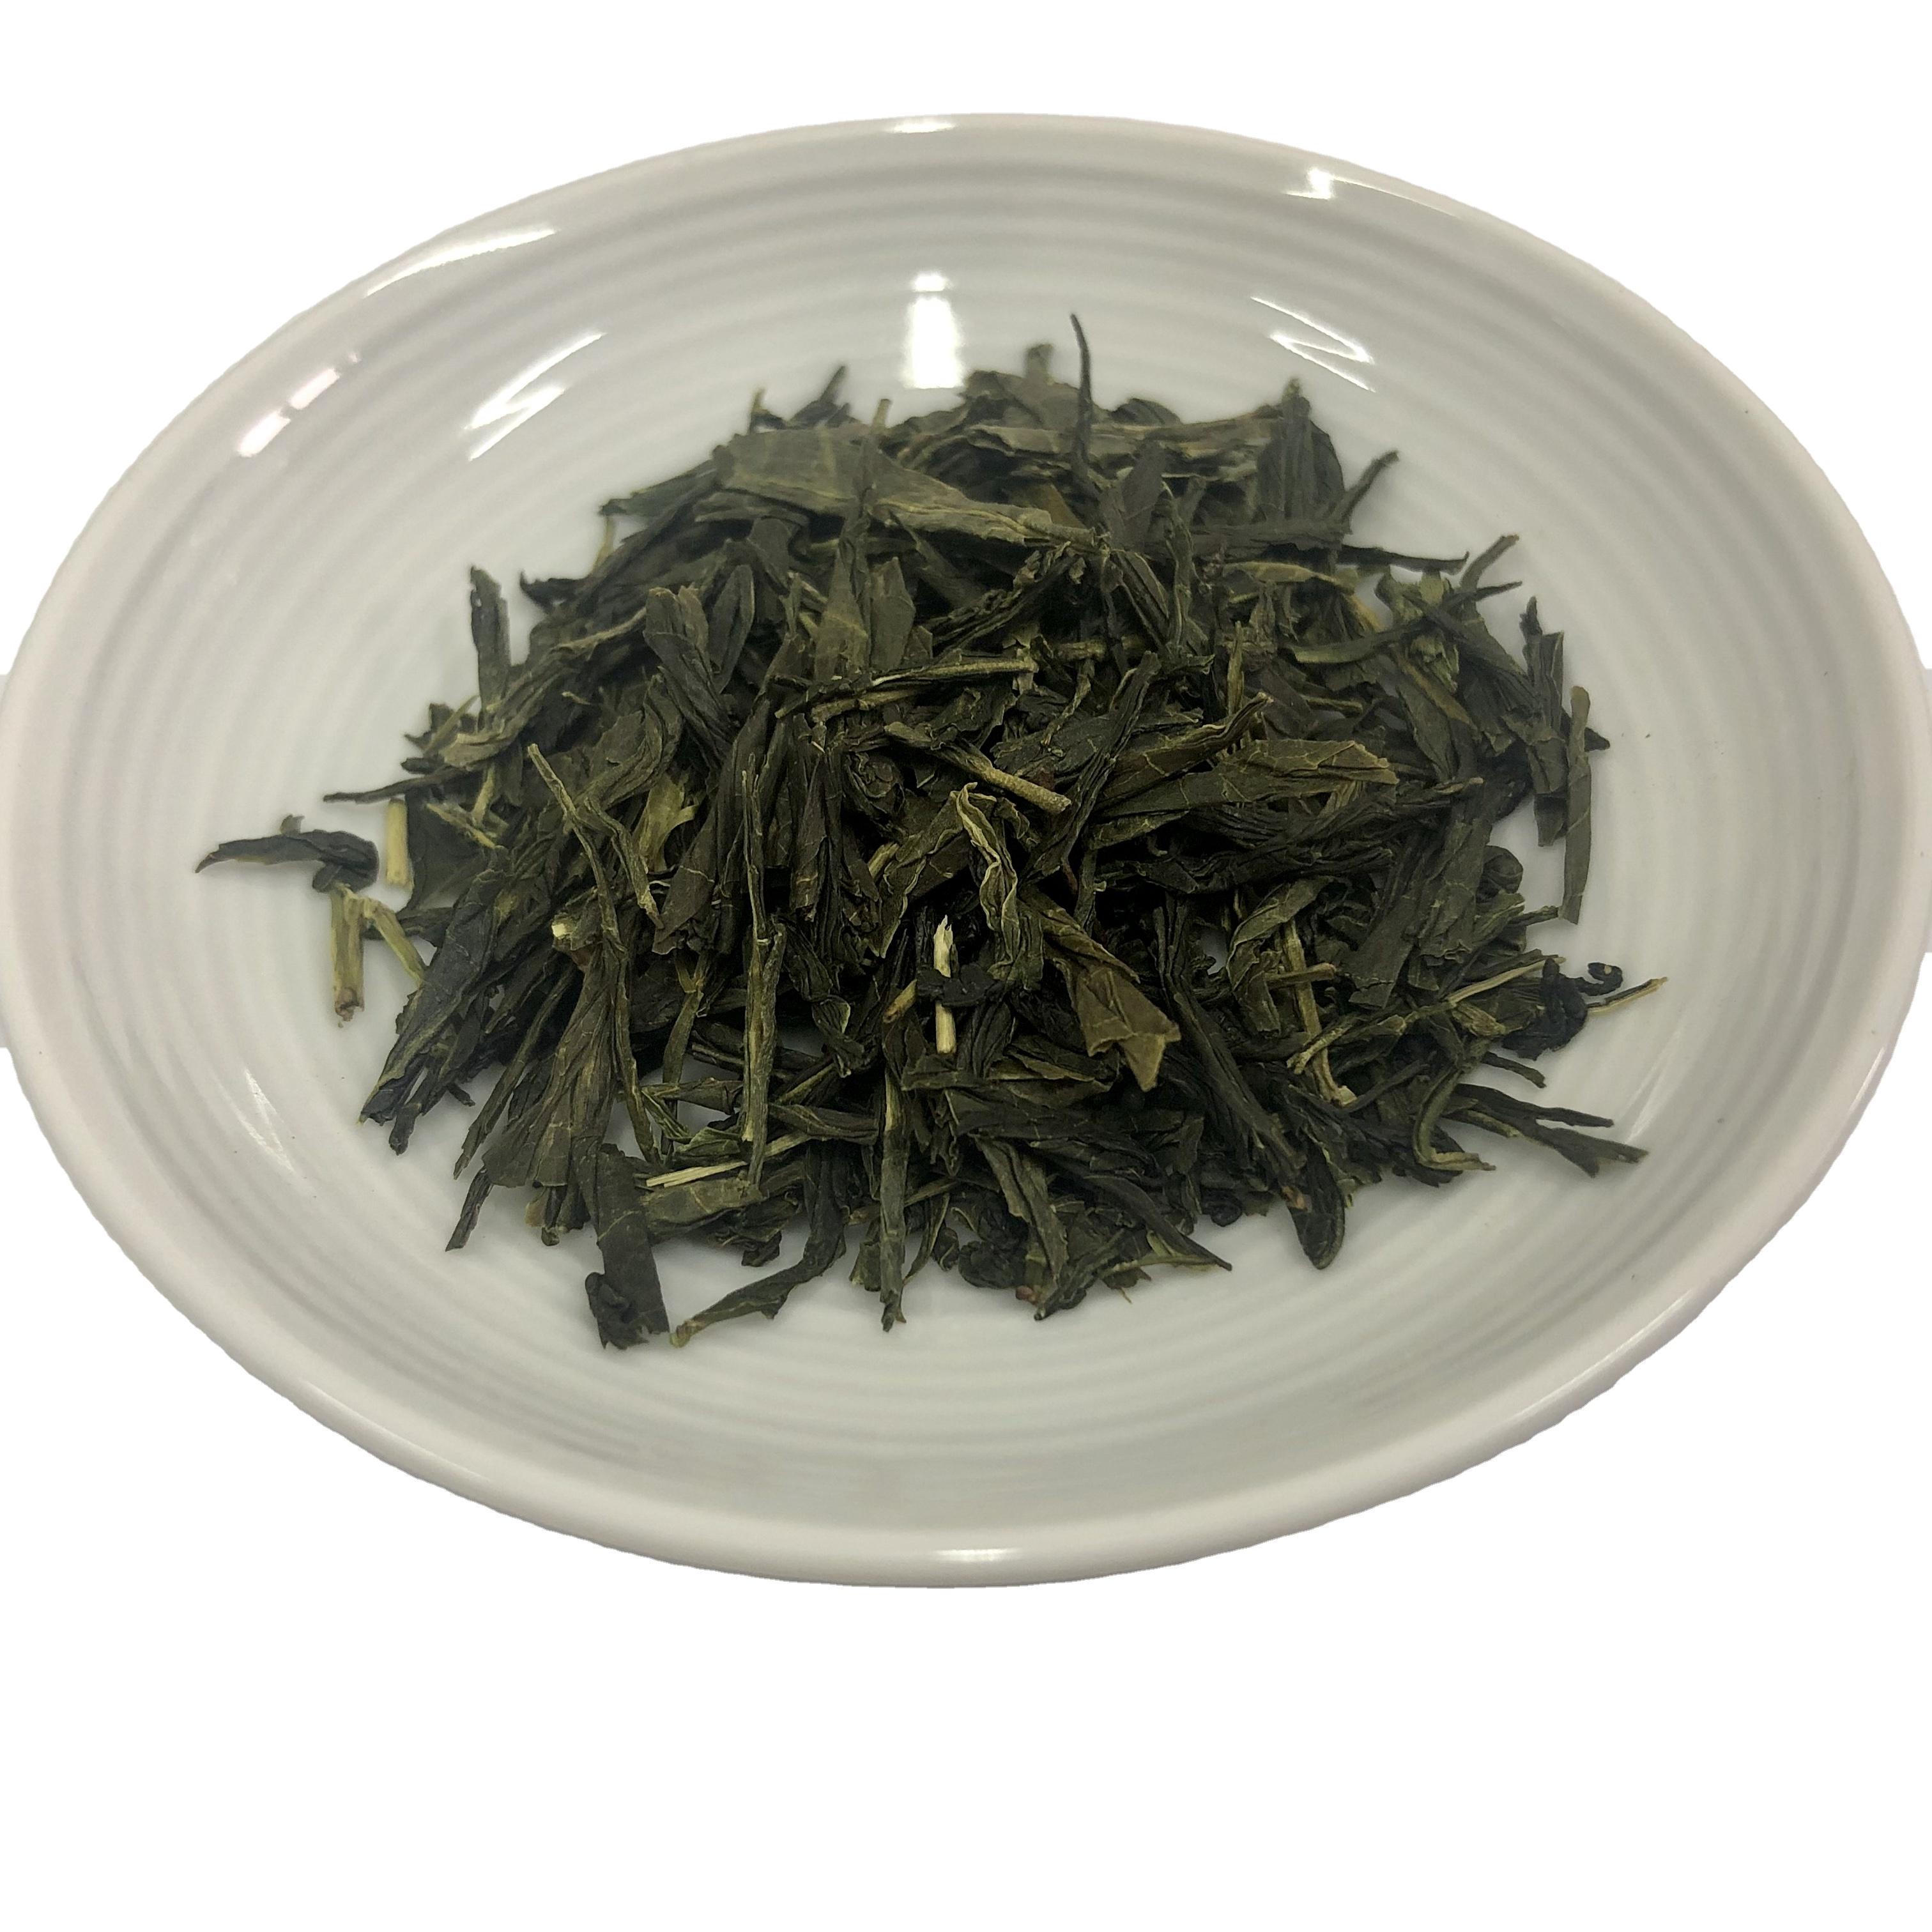 Whole sale Green Tea Dust Green Tea Fannings With EU Standard - 4uTea | 4uTea.com